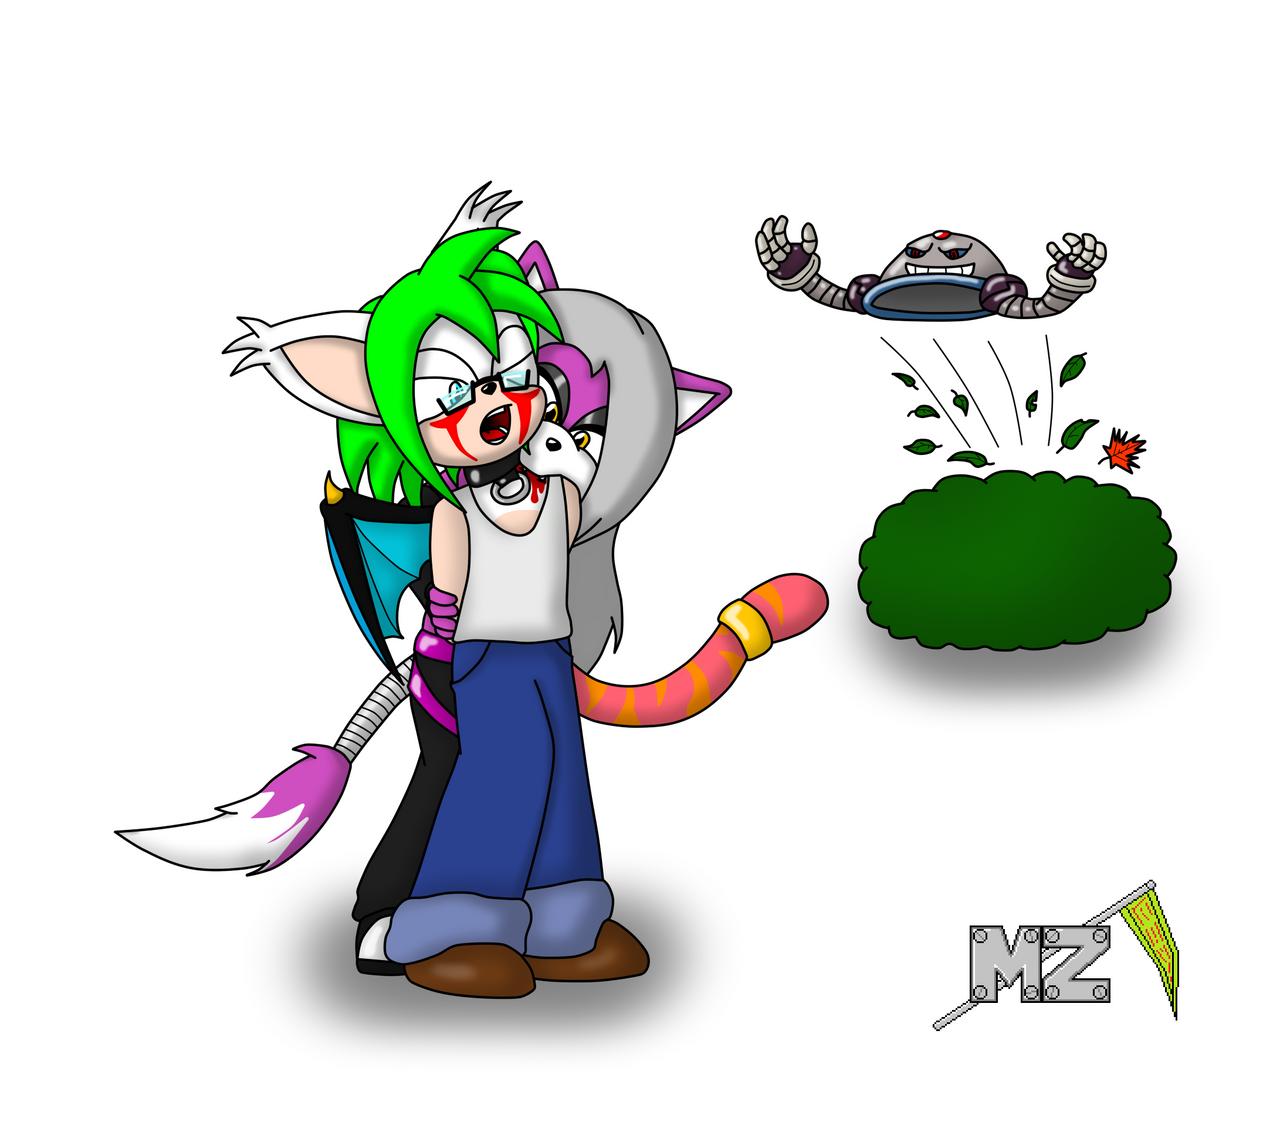 commission: thebloodredwolf 1 of 3 by metalzaki